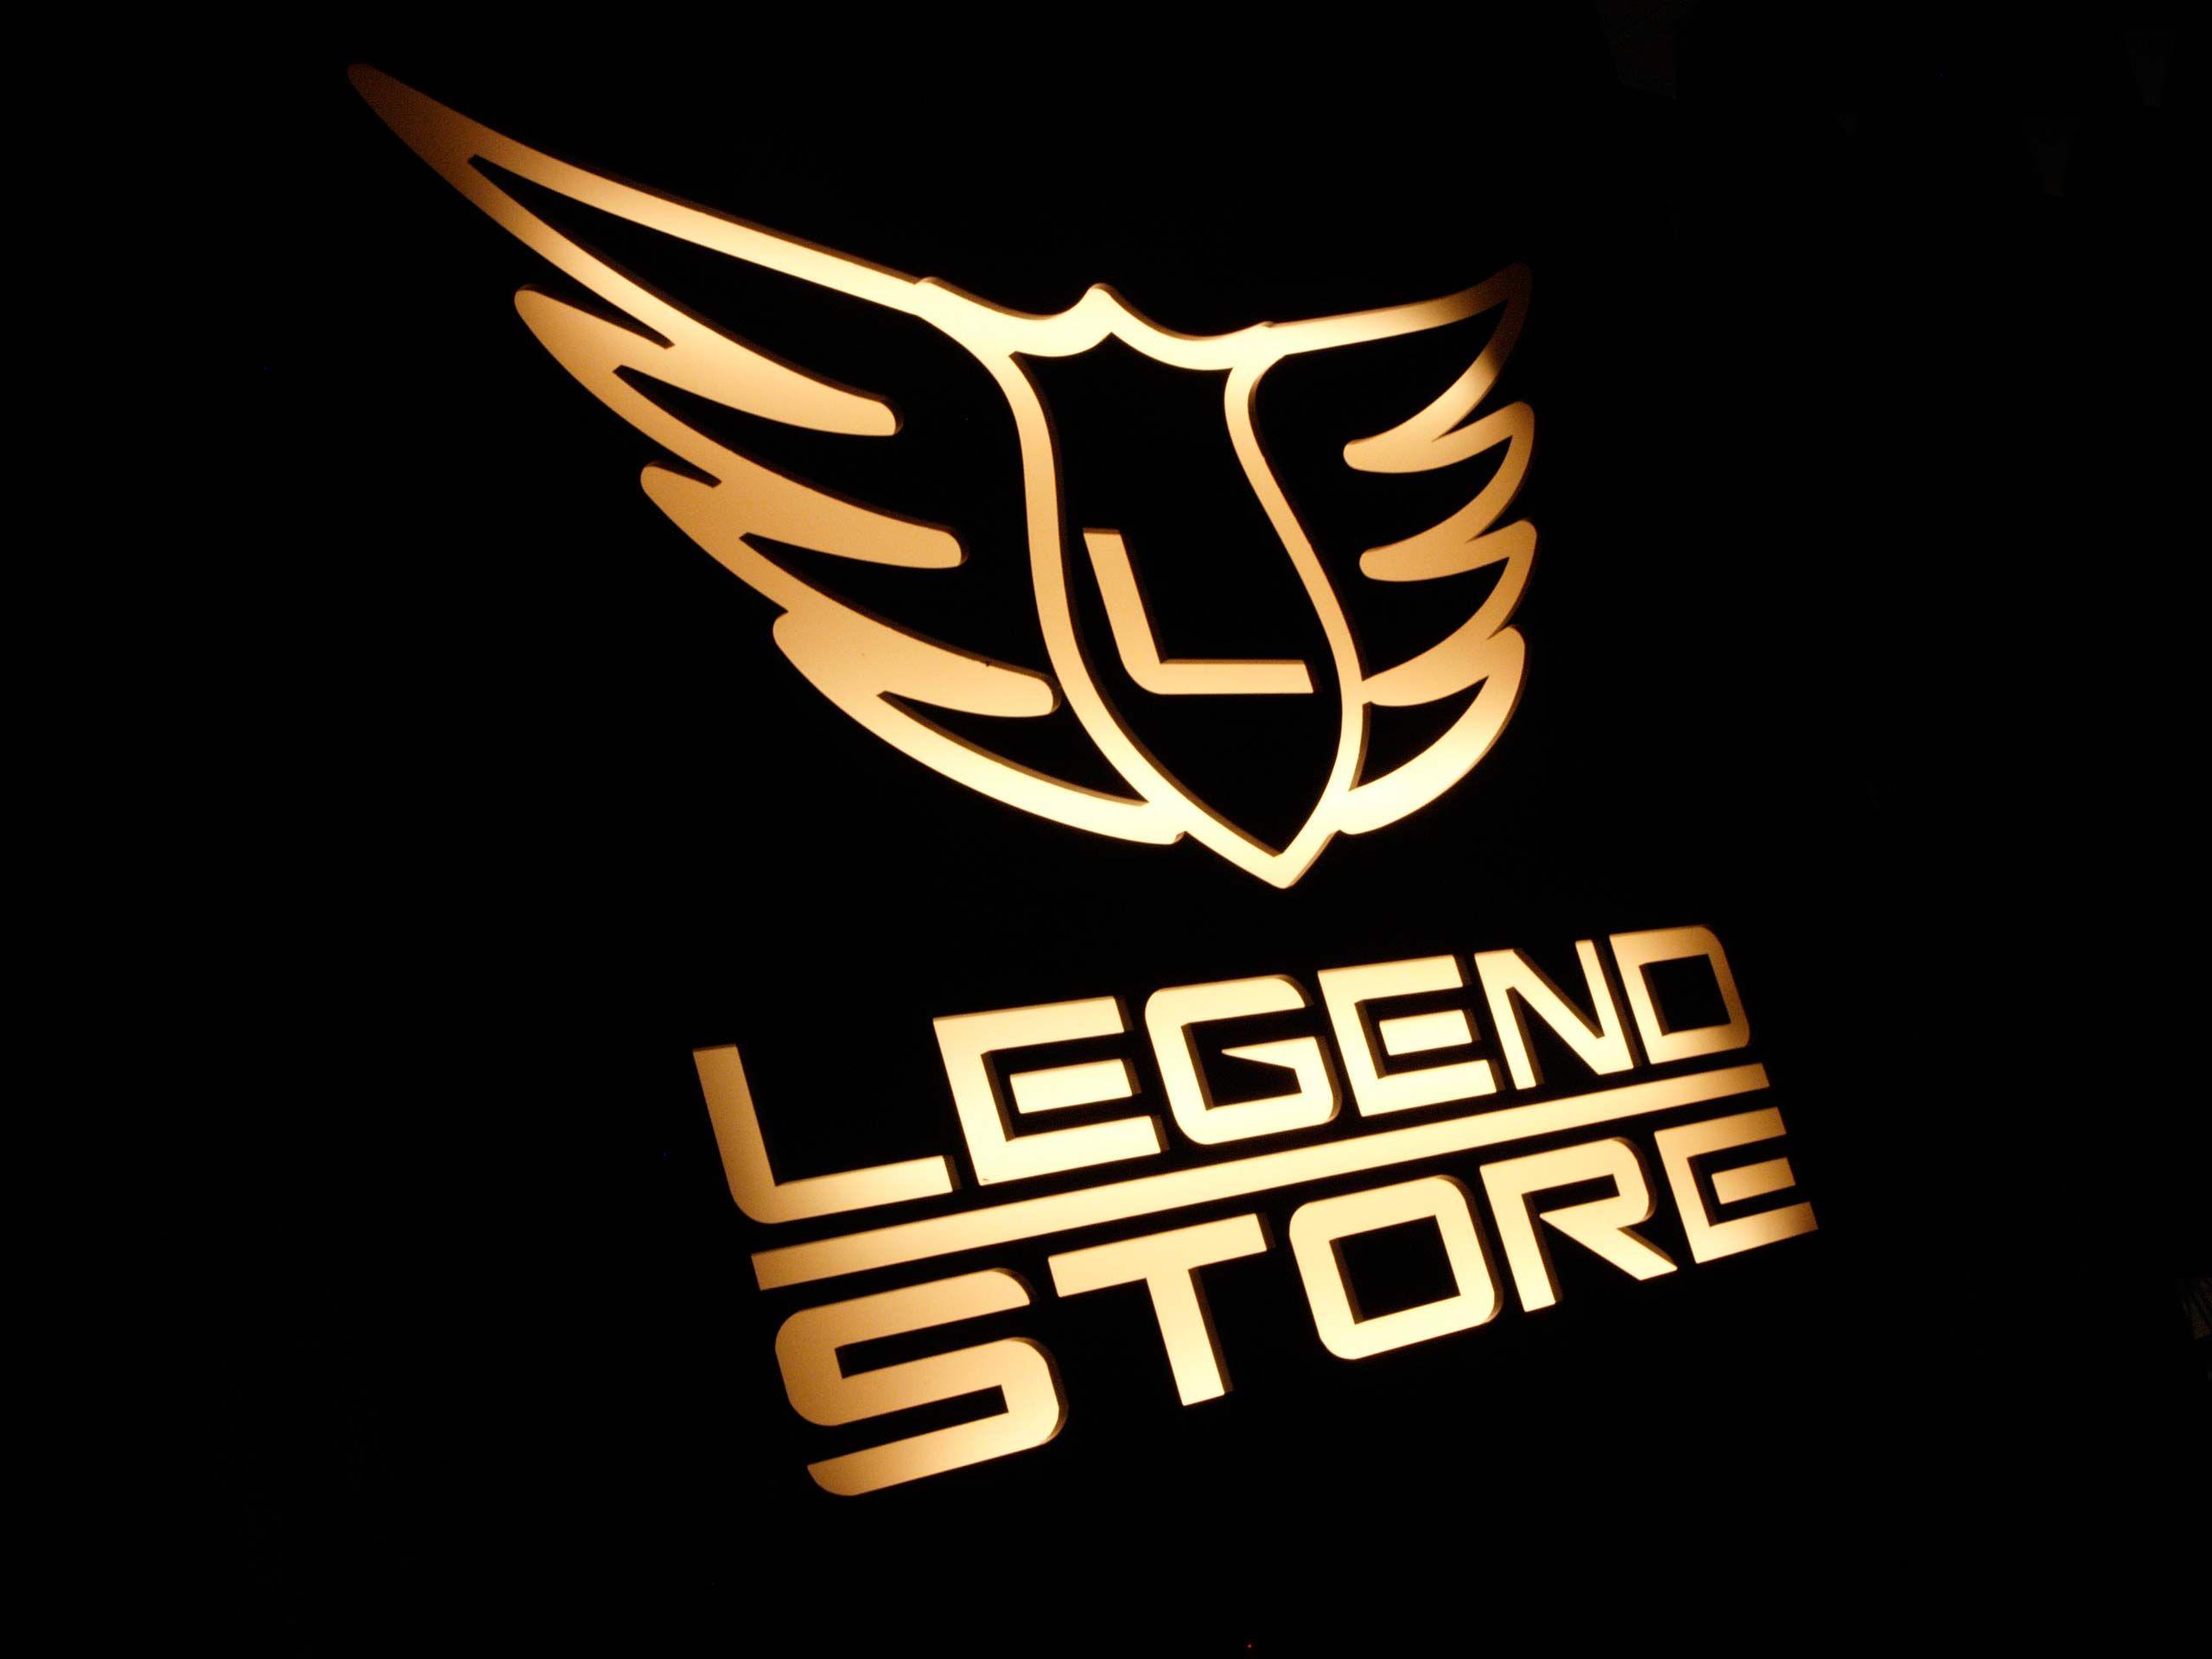 Studio logo Legend Store